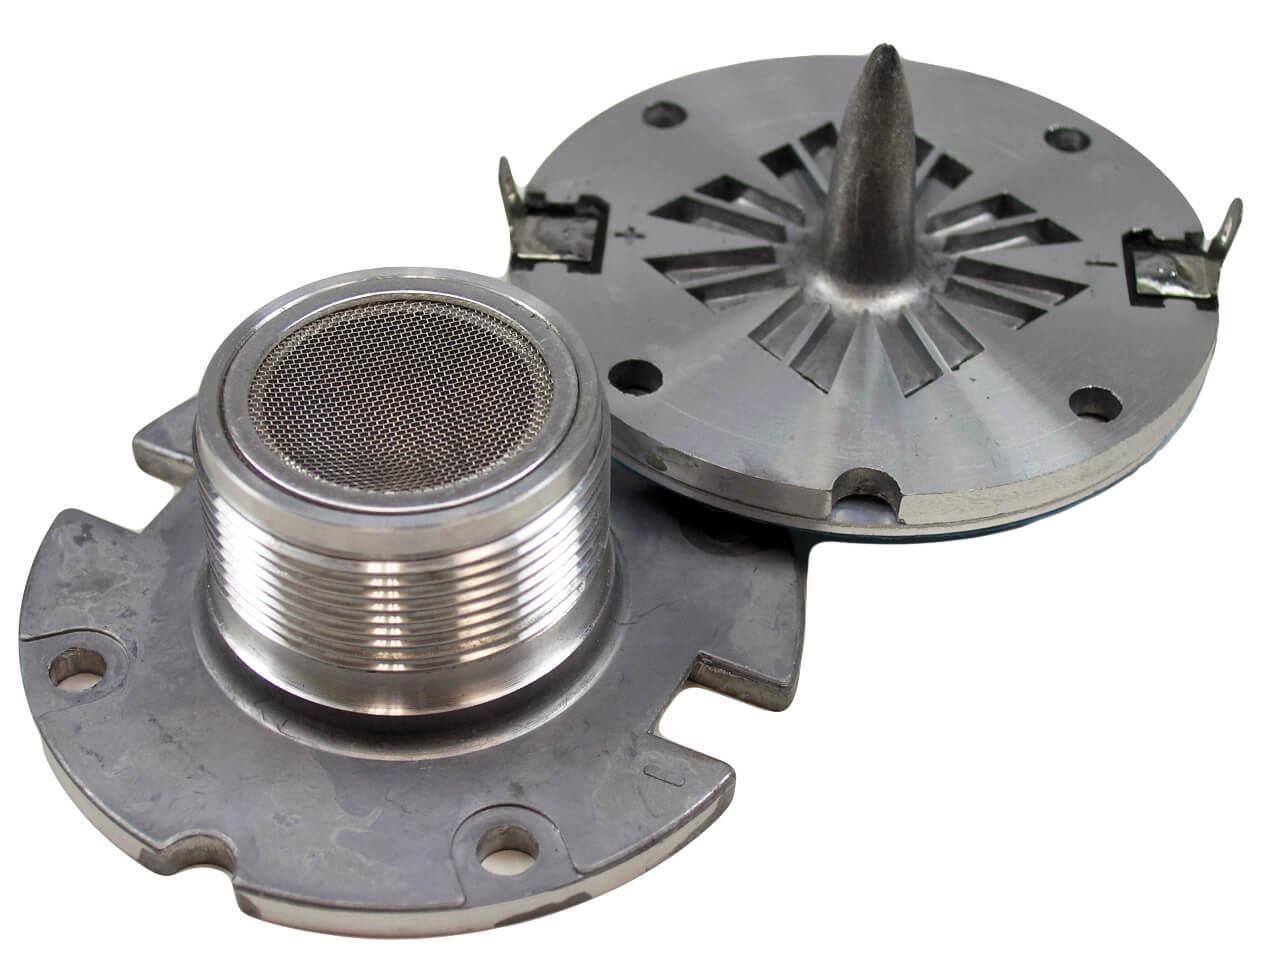 JBL Diaphragm Copy for AC18 AC28 2408H-1 Horn Driver Repair (Single)